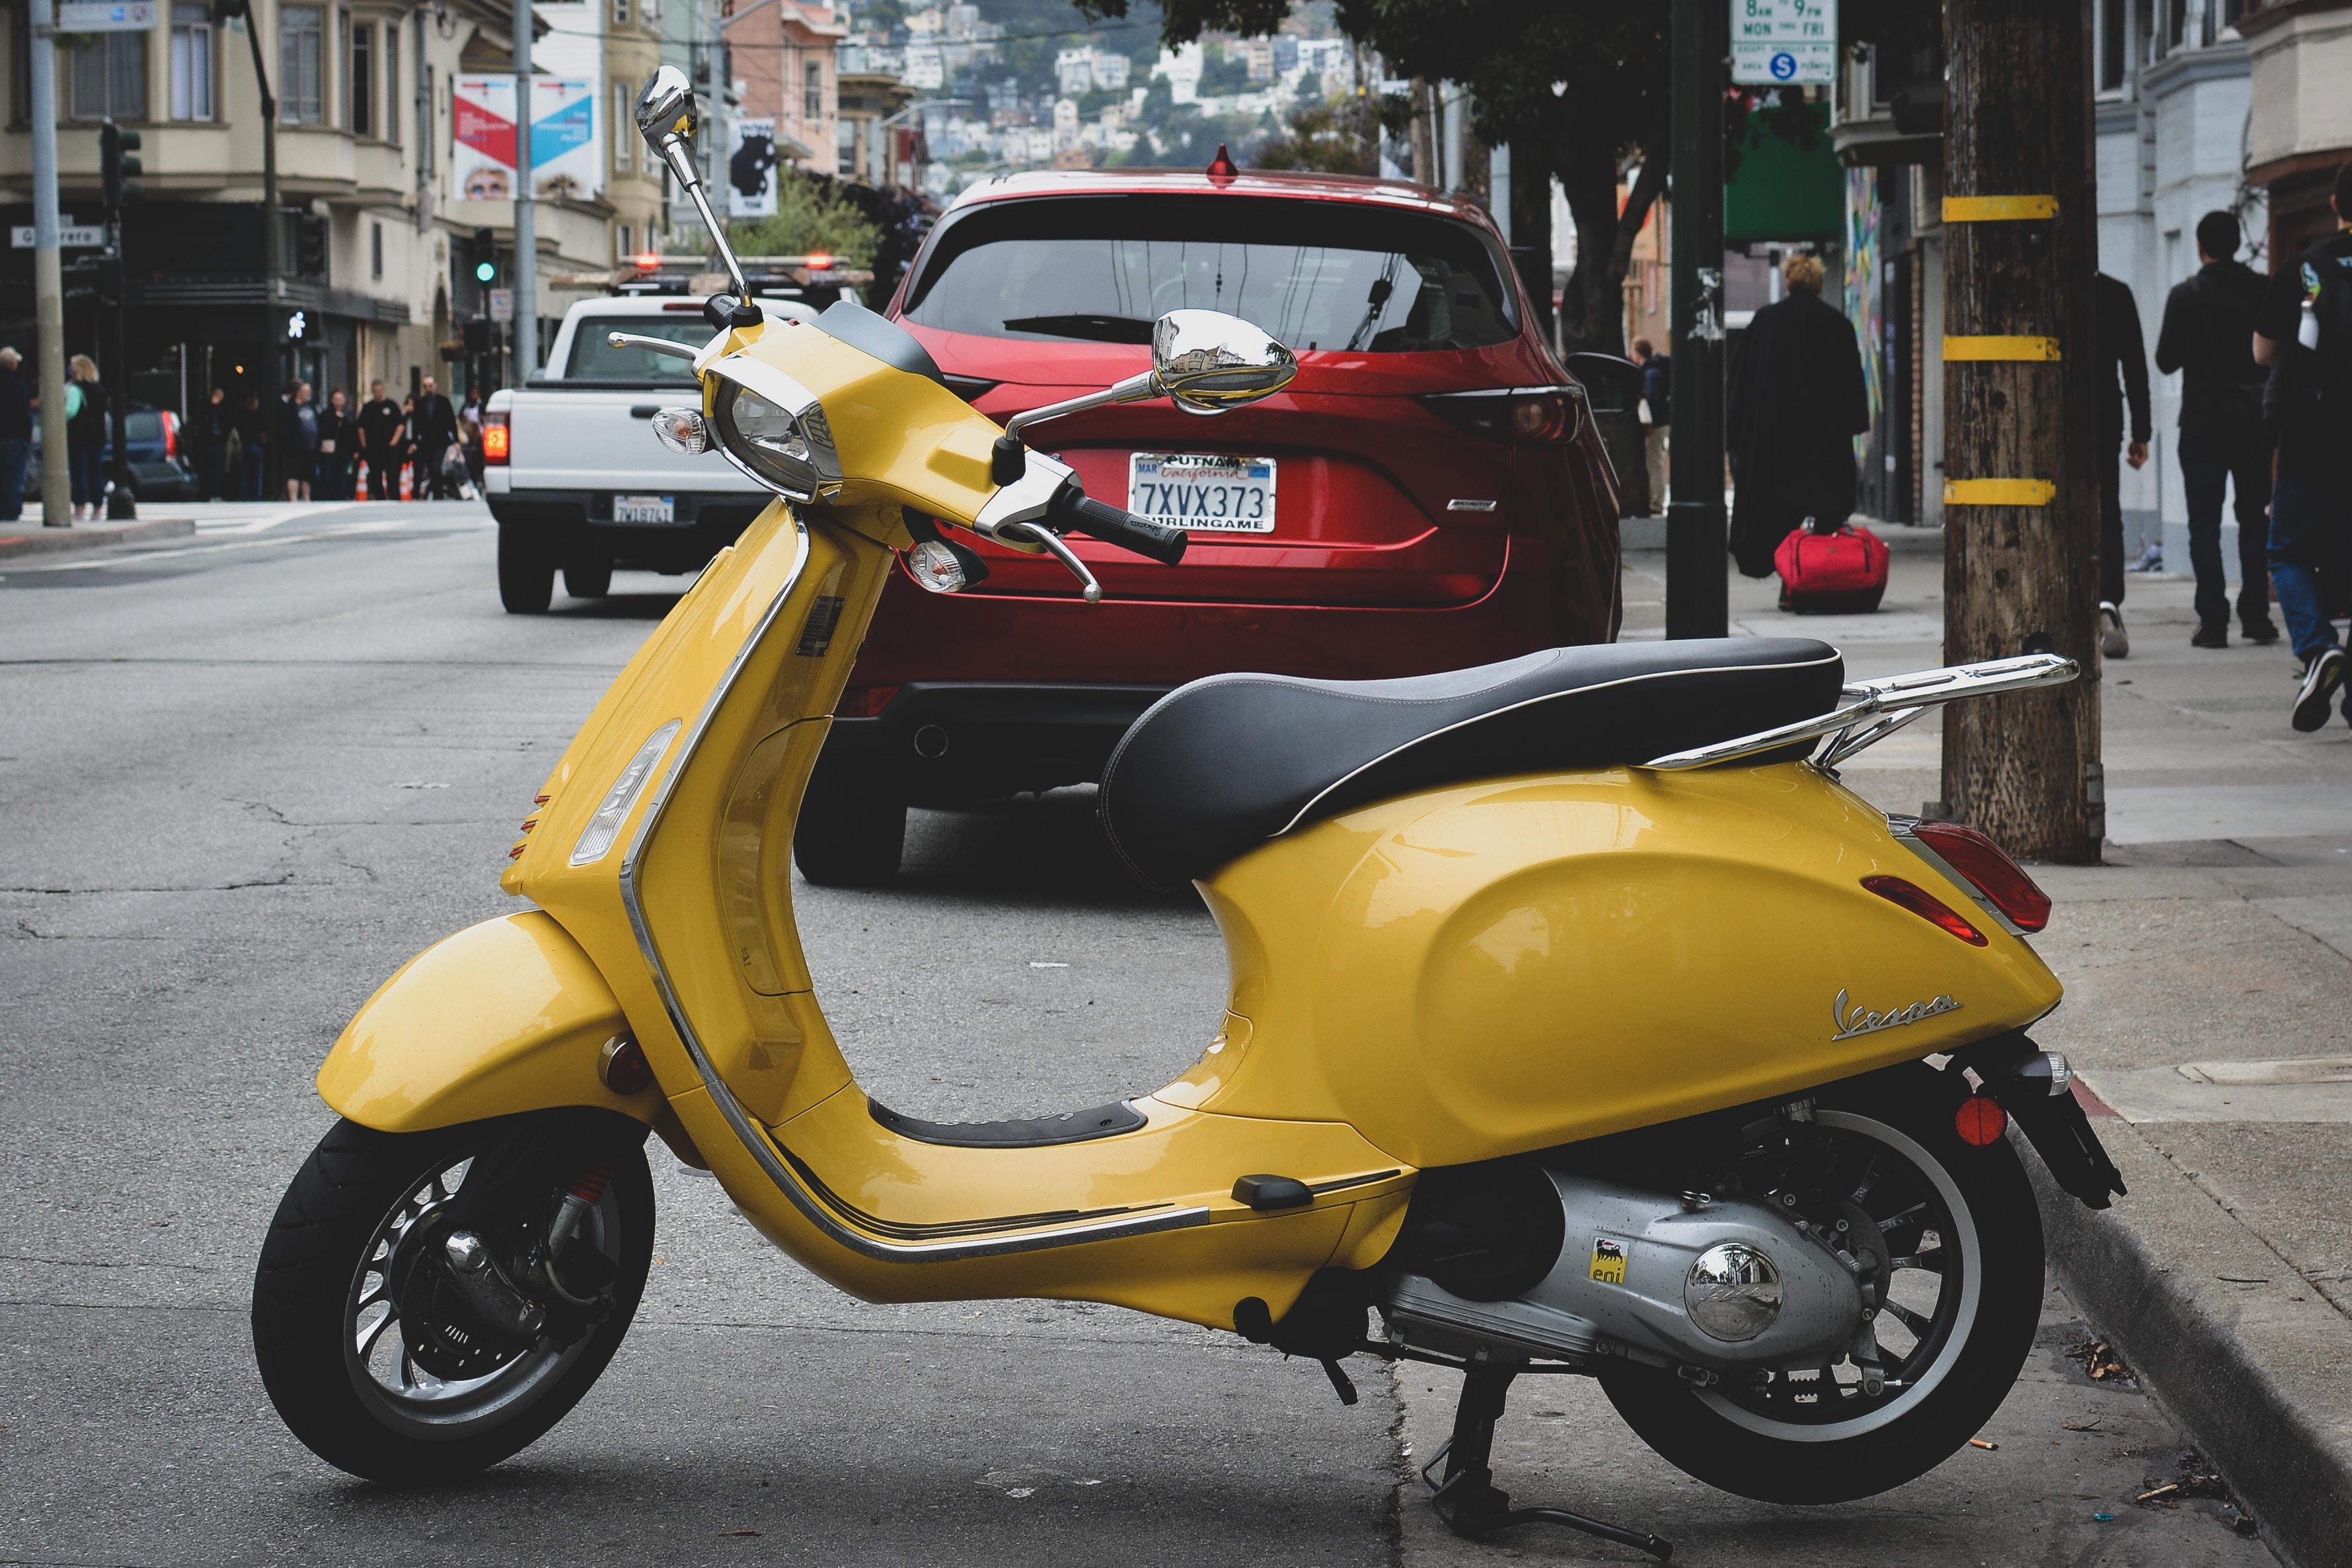 yellow motor scooter parked near sidewalk